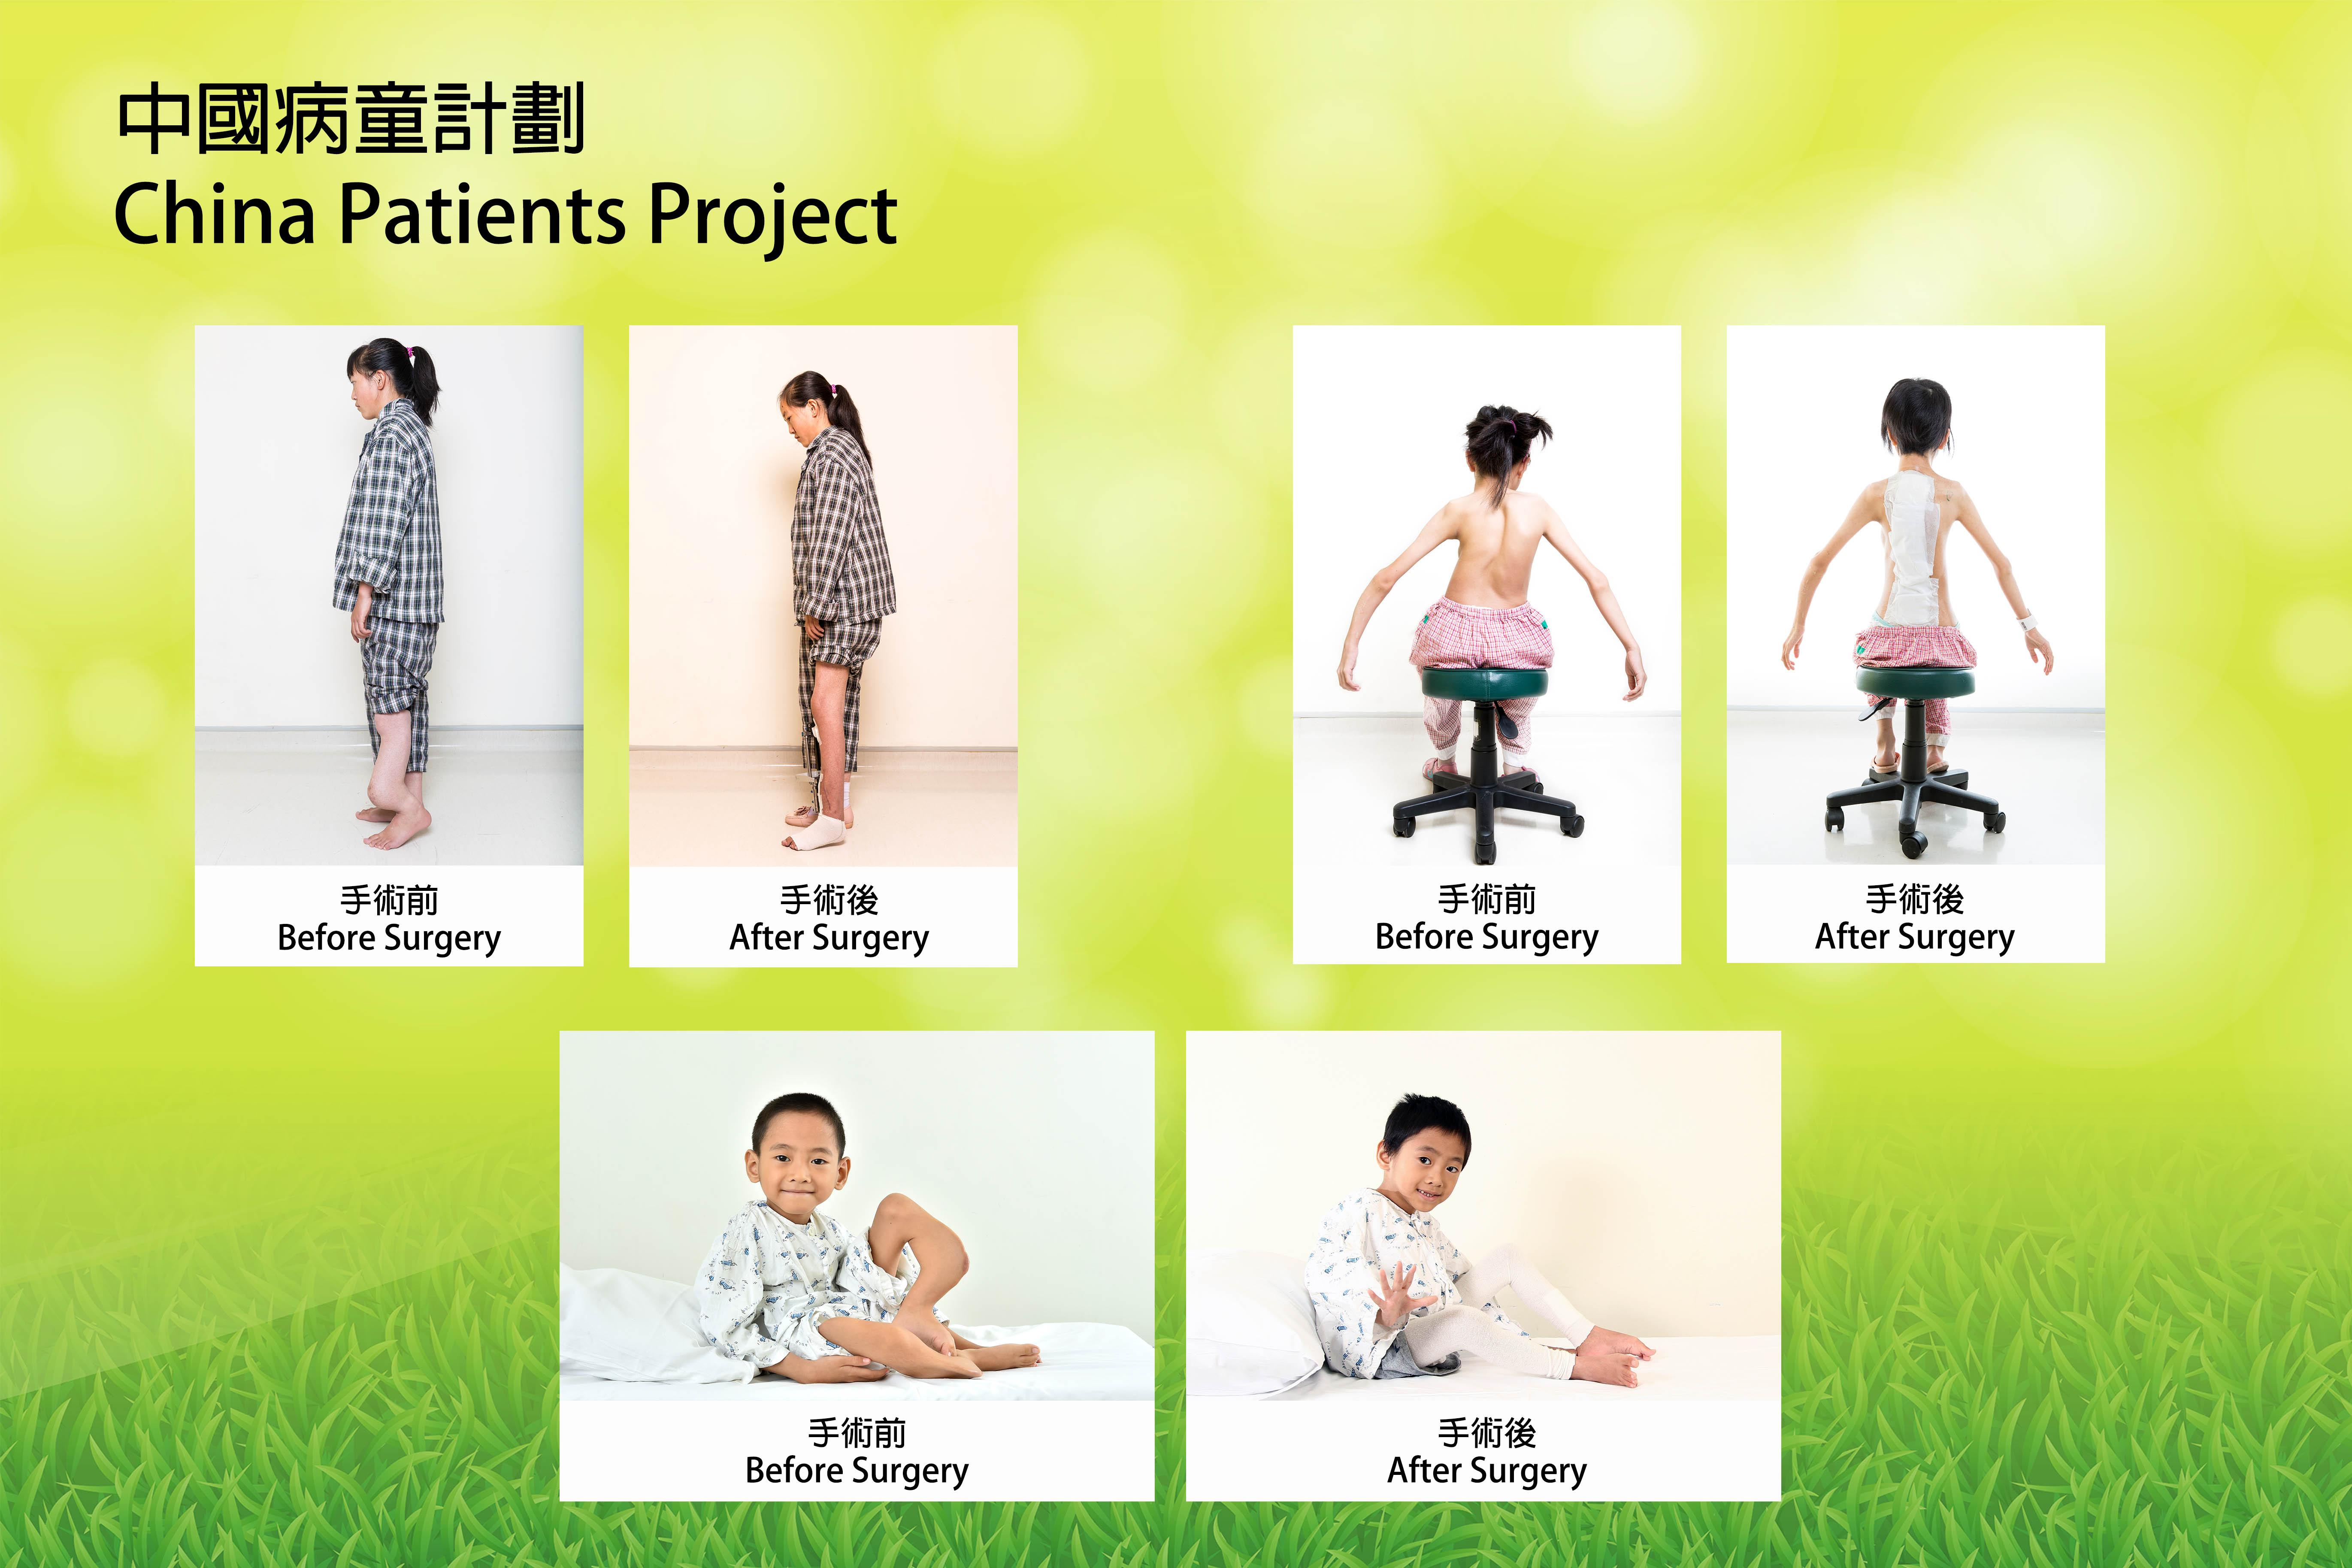 China Patients Project 中國病童計劃